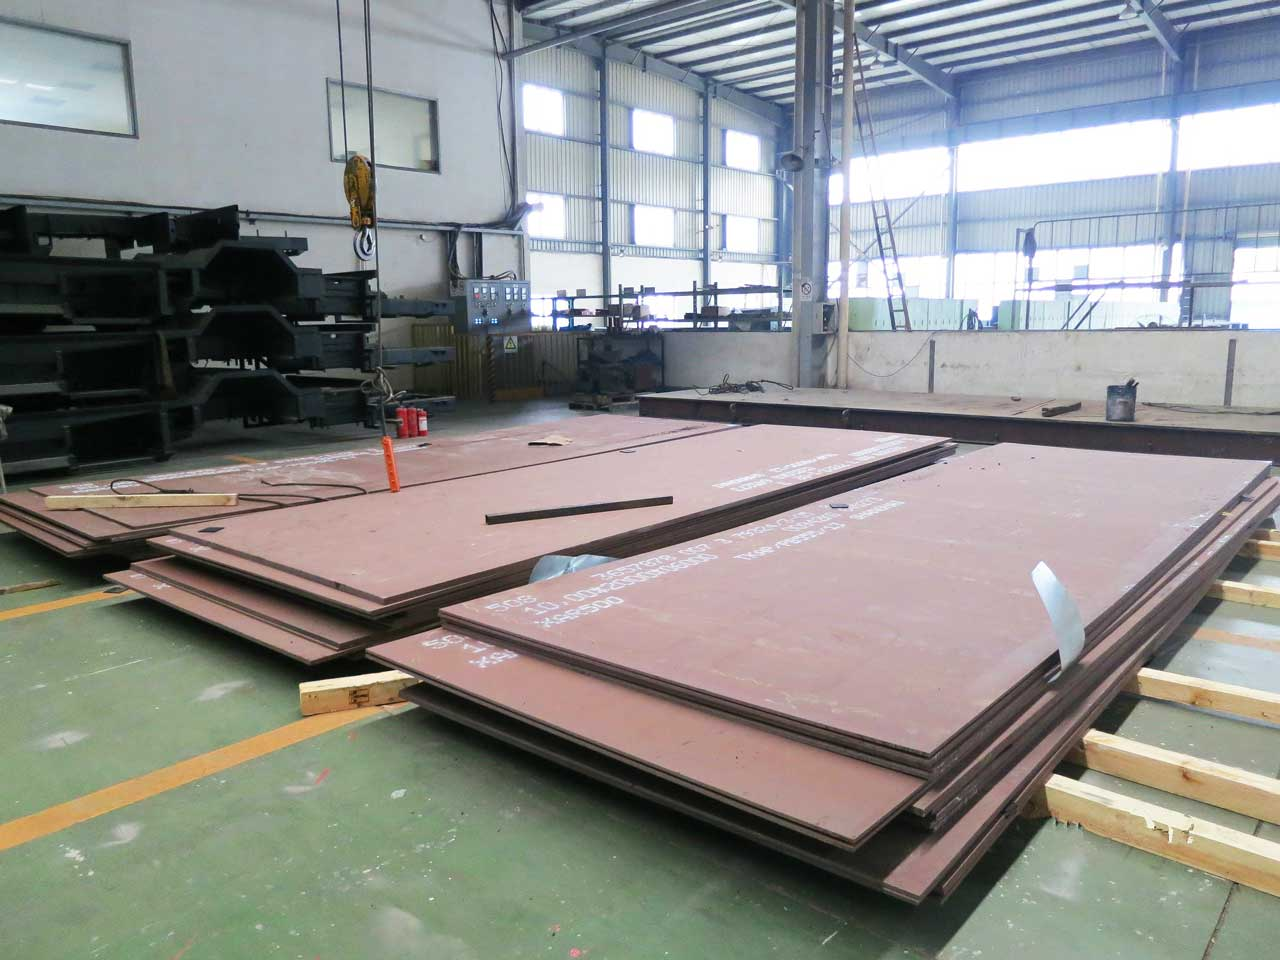 NM400 abrasion resistant steel plates